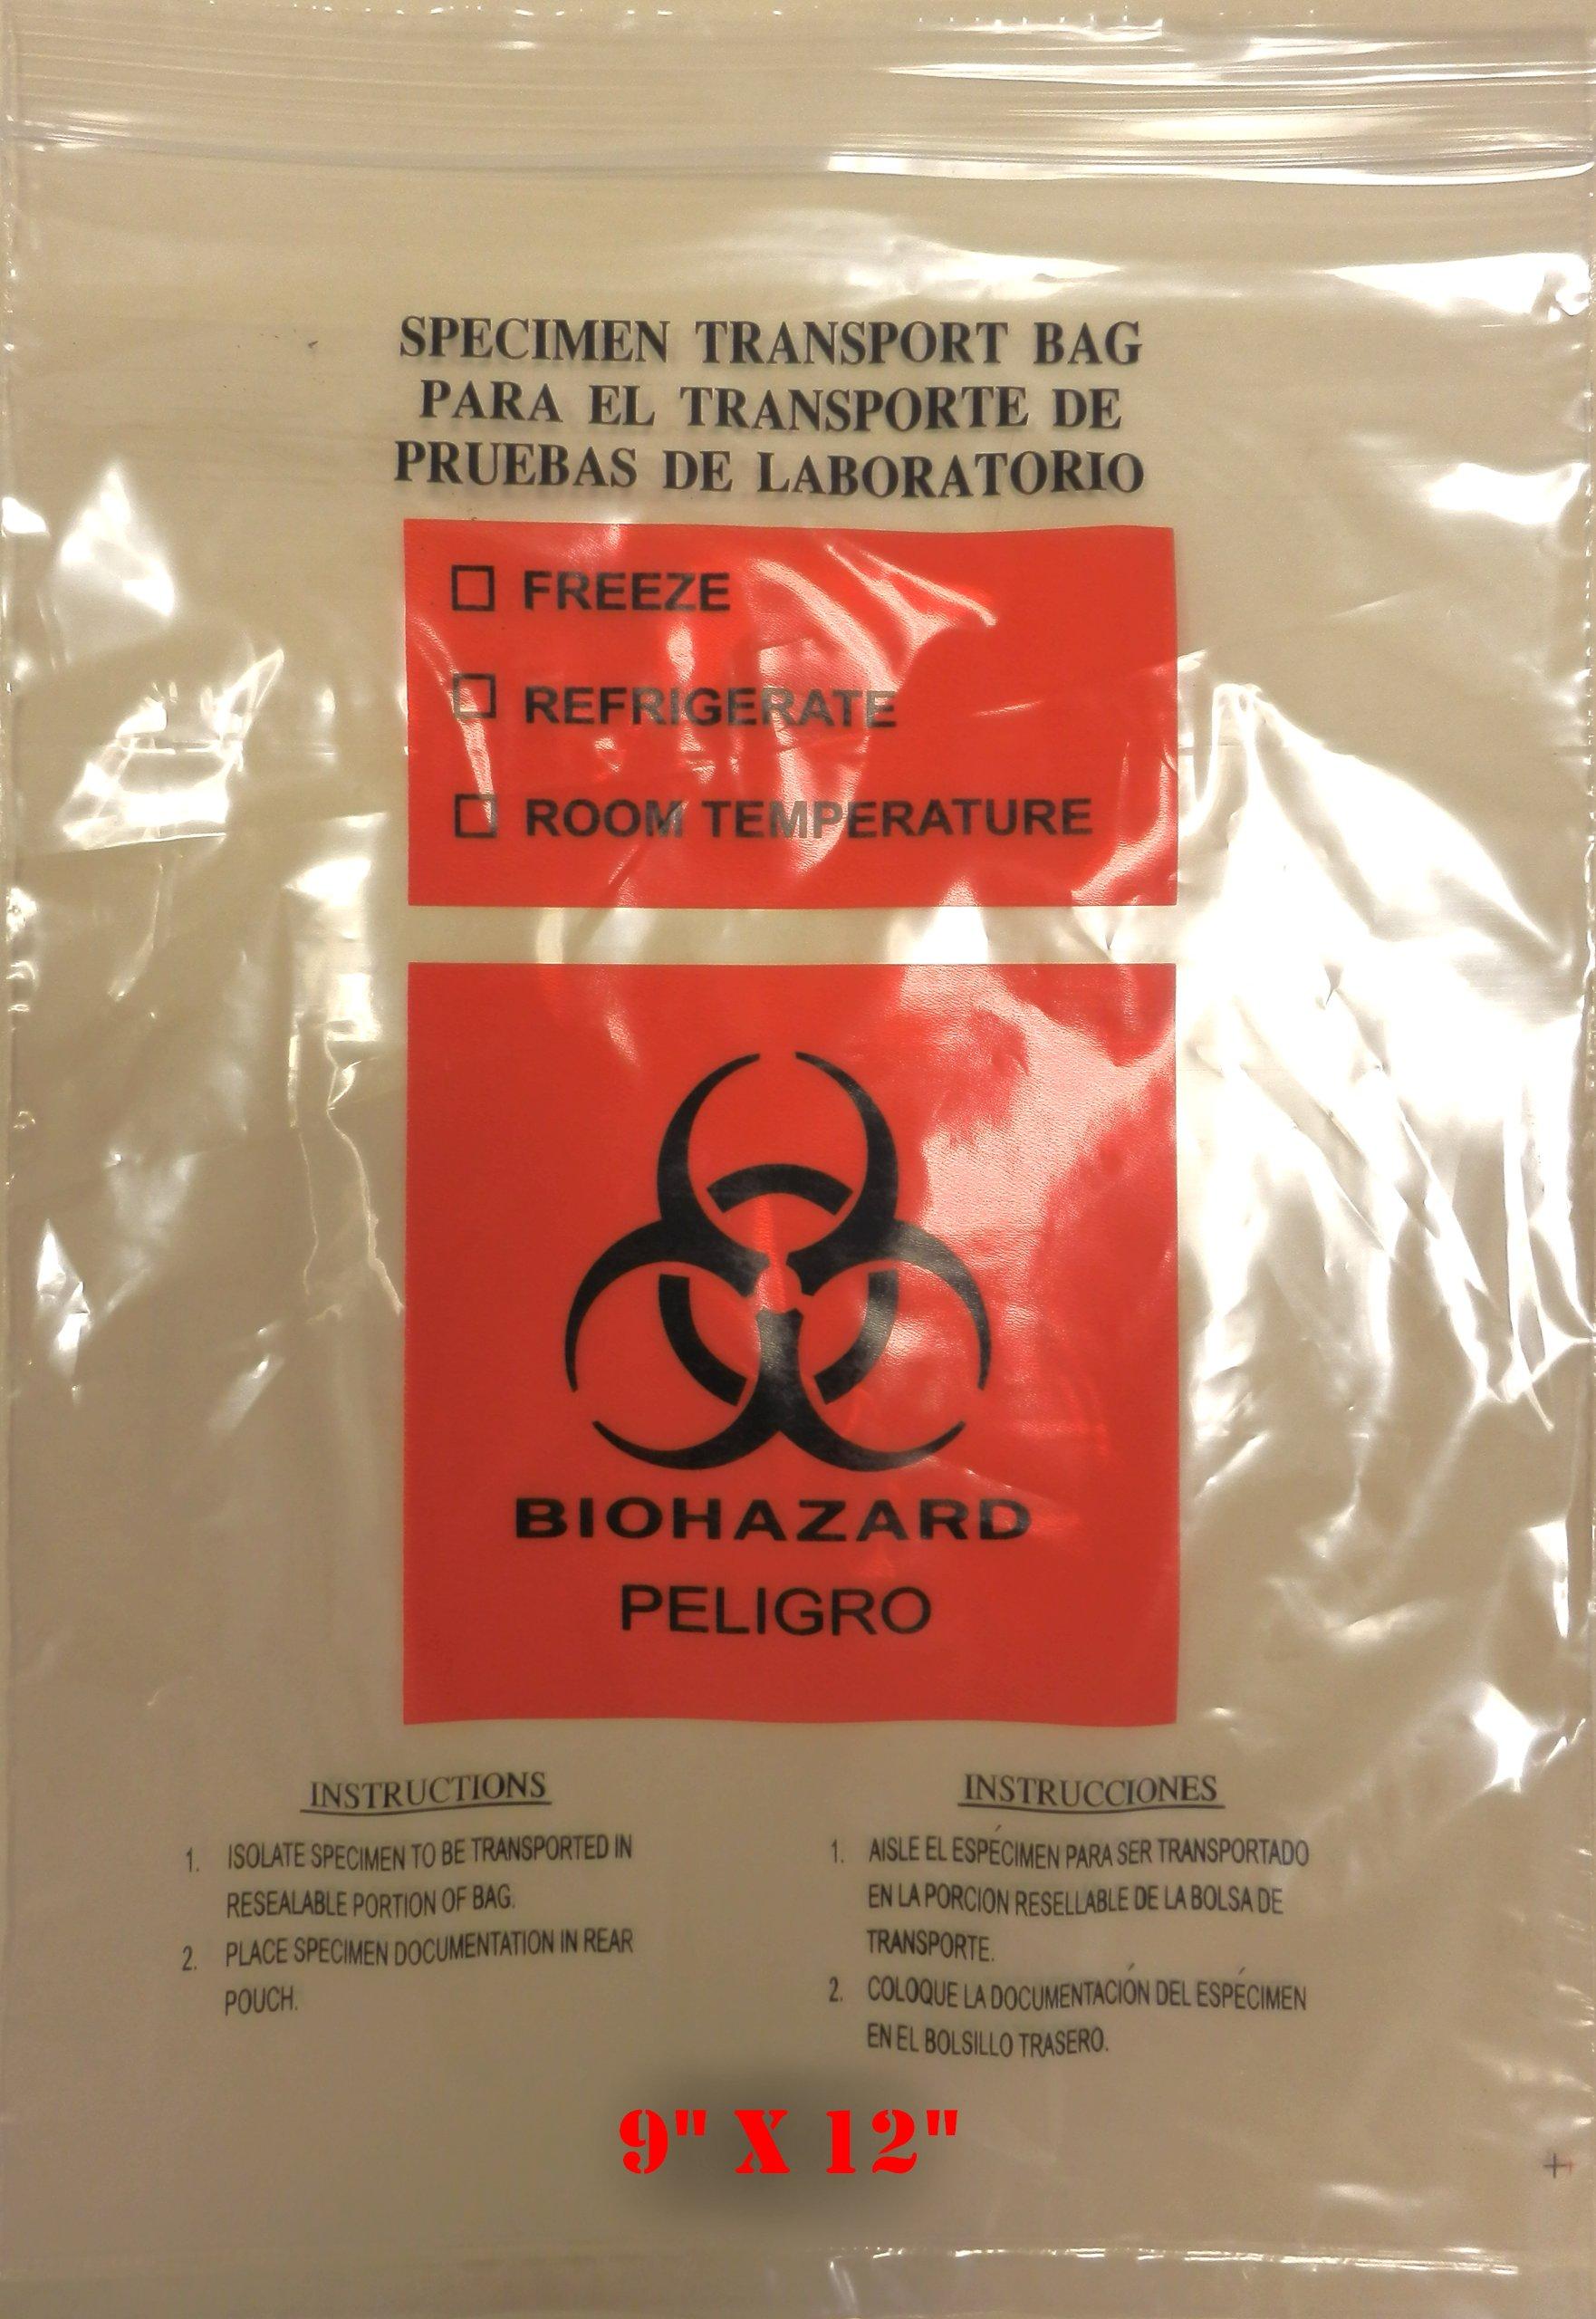 SNL Quality Biohazard 'Double Pocket' Specimen Zip Lock Style Bags - 9'' X 12'' (Pack of 100 Bags)